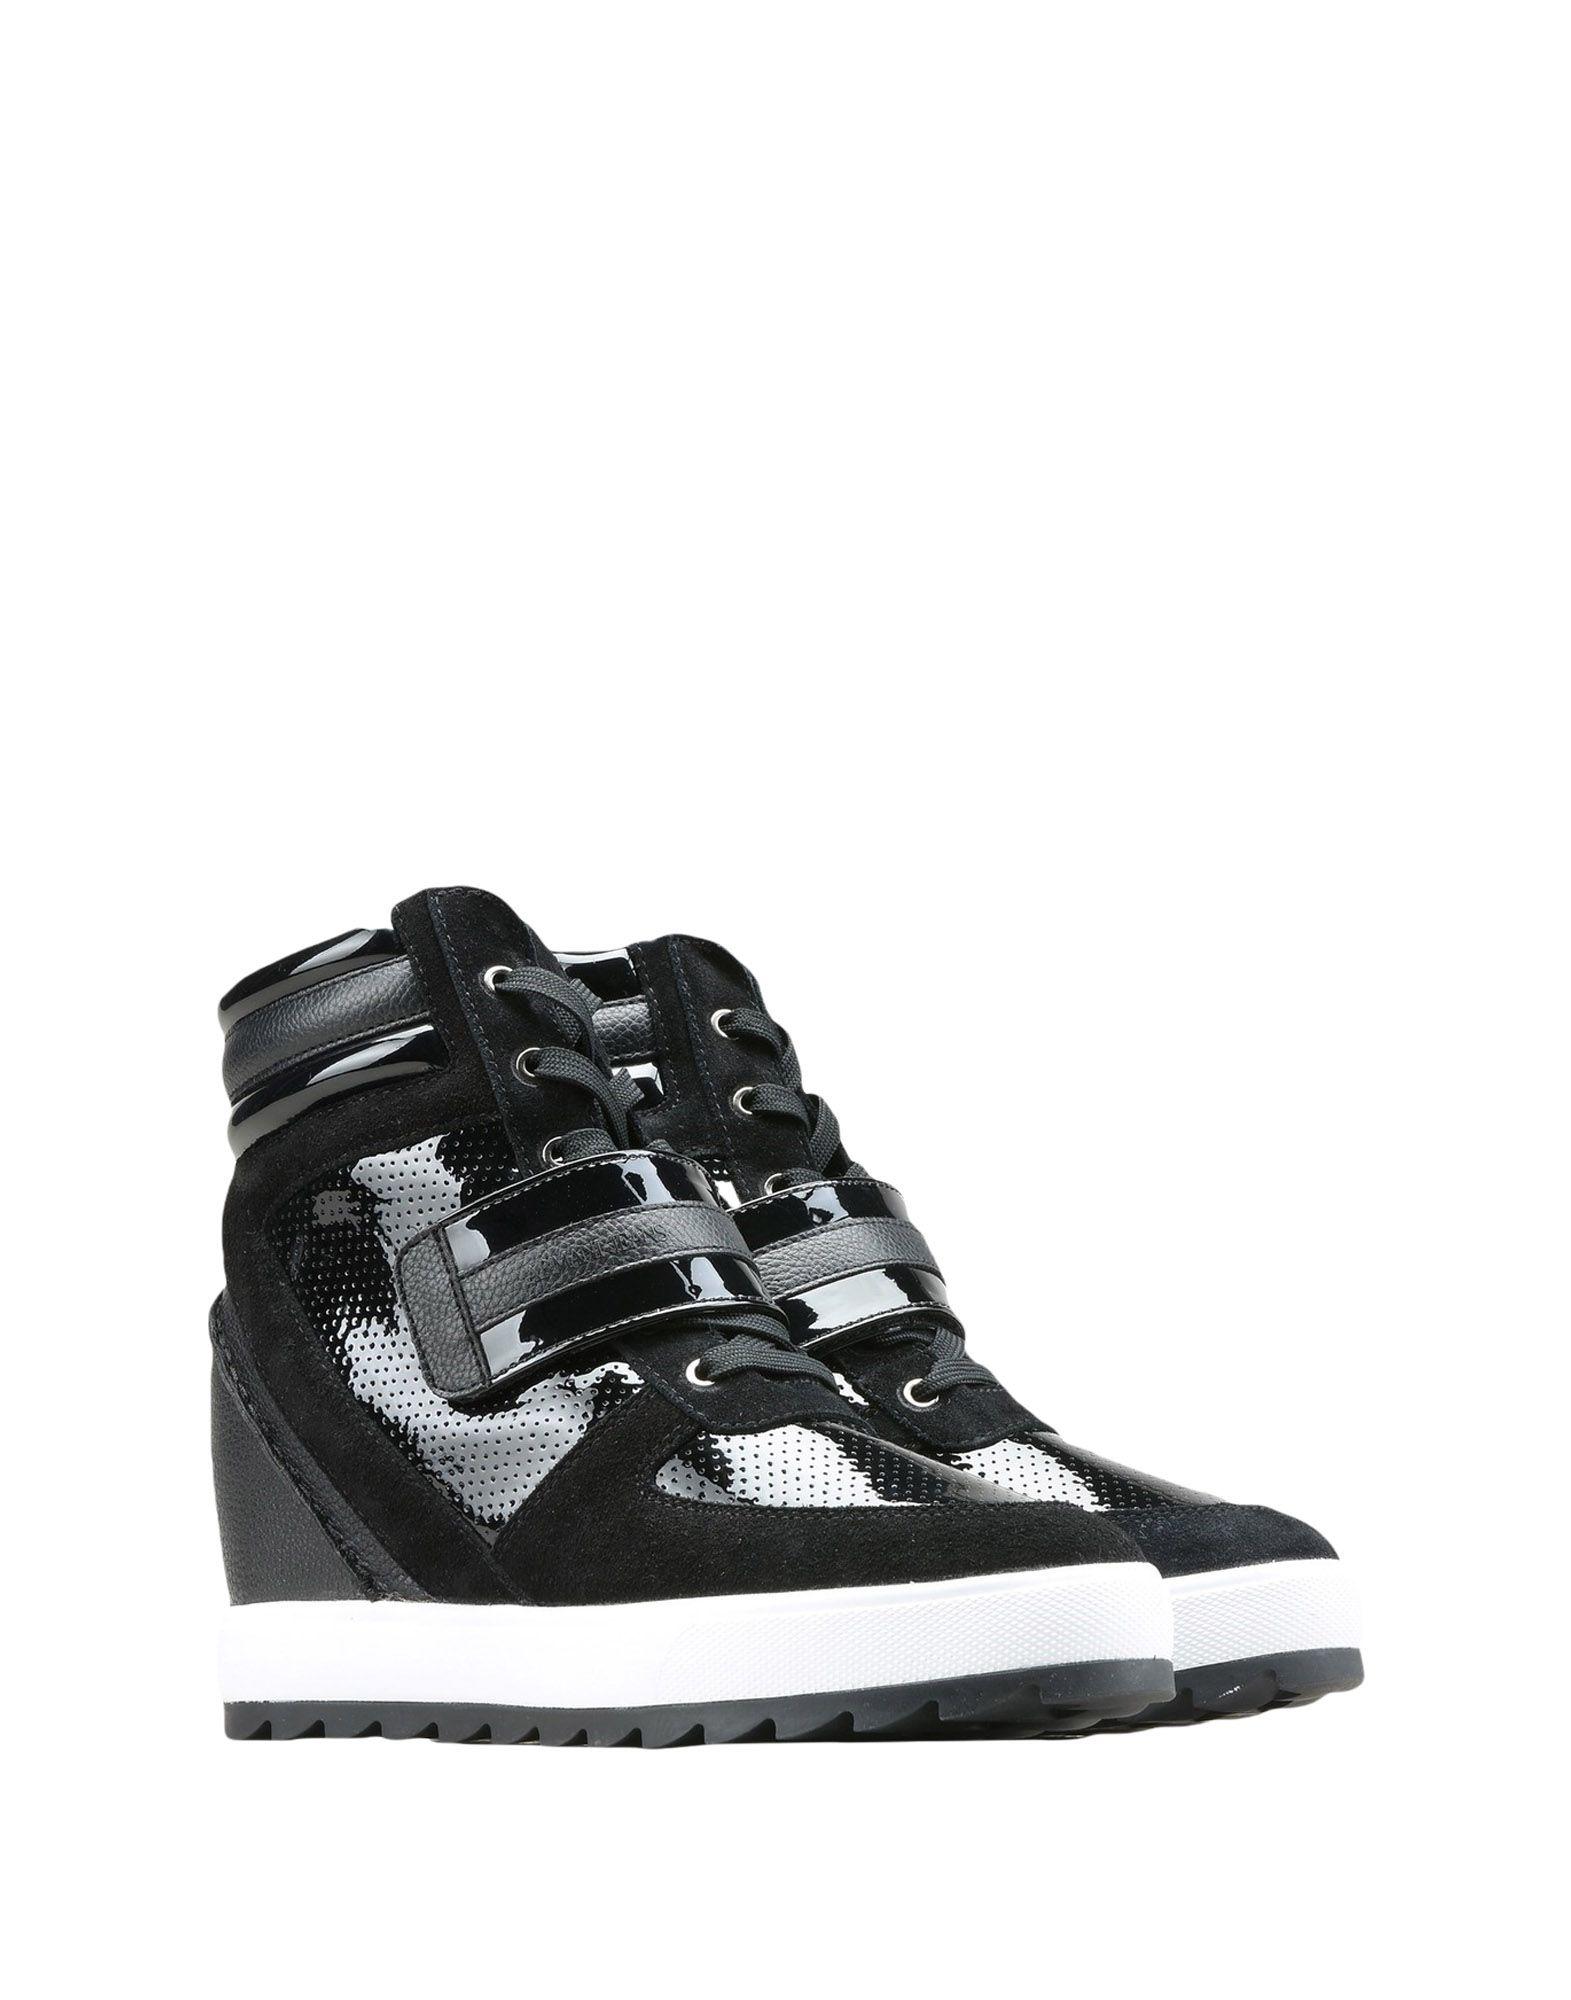 773914c2286 ARMANI JEANS ΠΑΠΟΥΤΣΙΑ Χαμηλά sneakers, Γυναικεία sneakers, ΓΥΝΑΙΚΑ ...